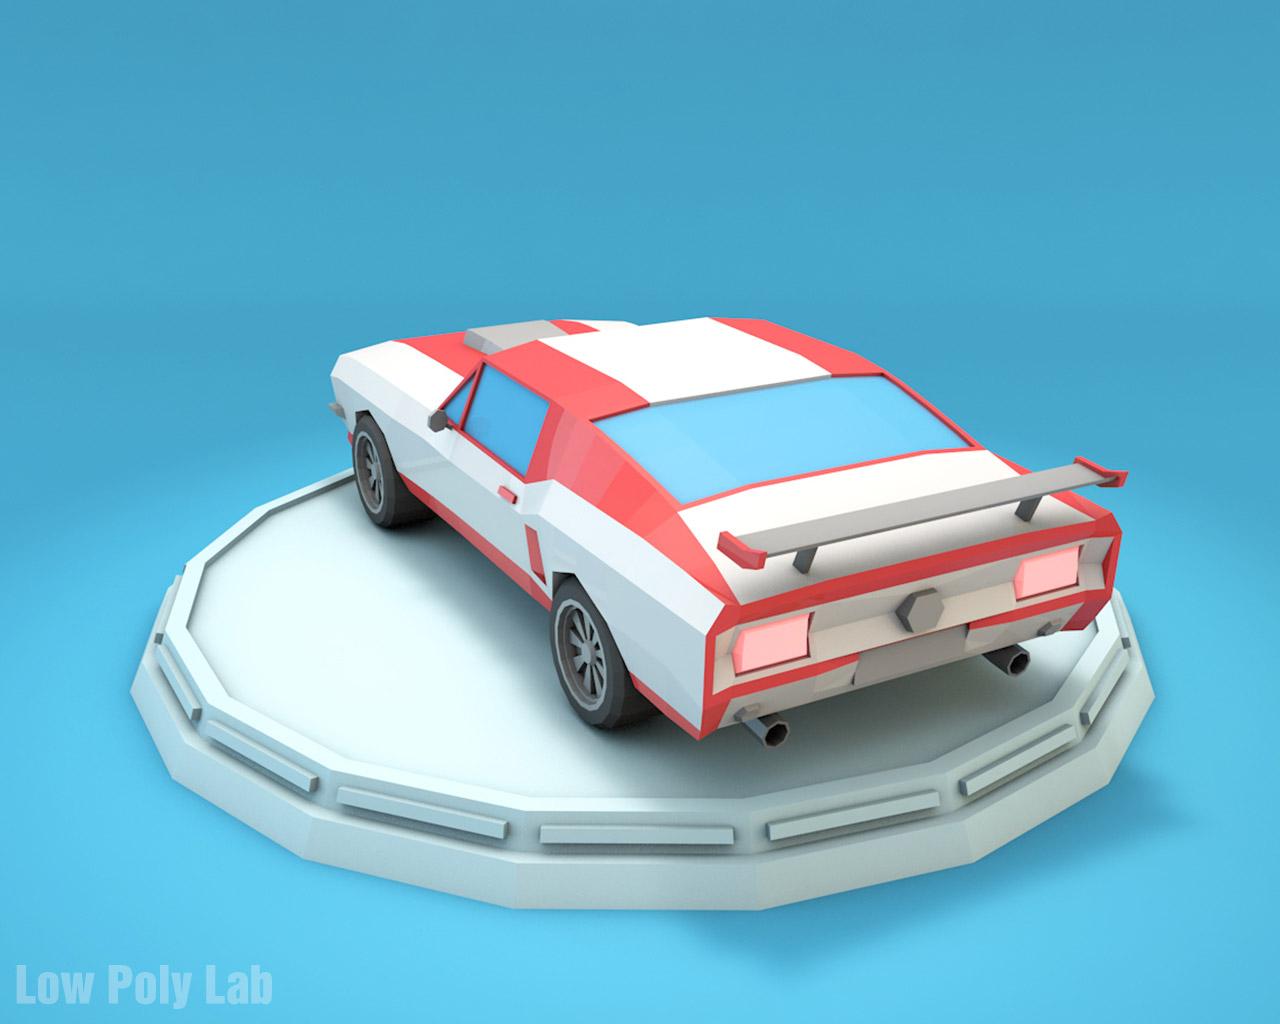 Low Poly Mustang Car By Bigballsstudio 3docean